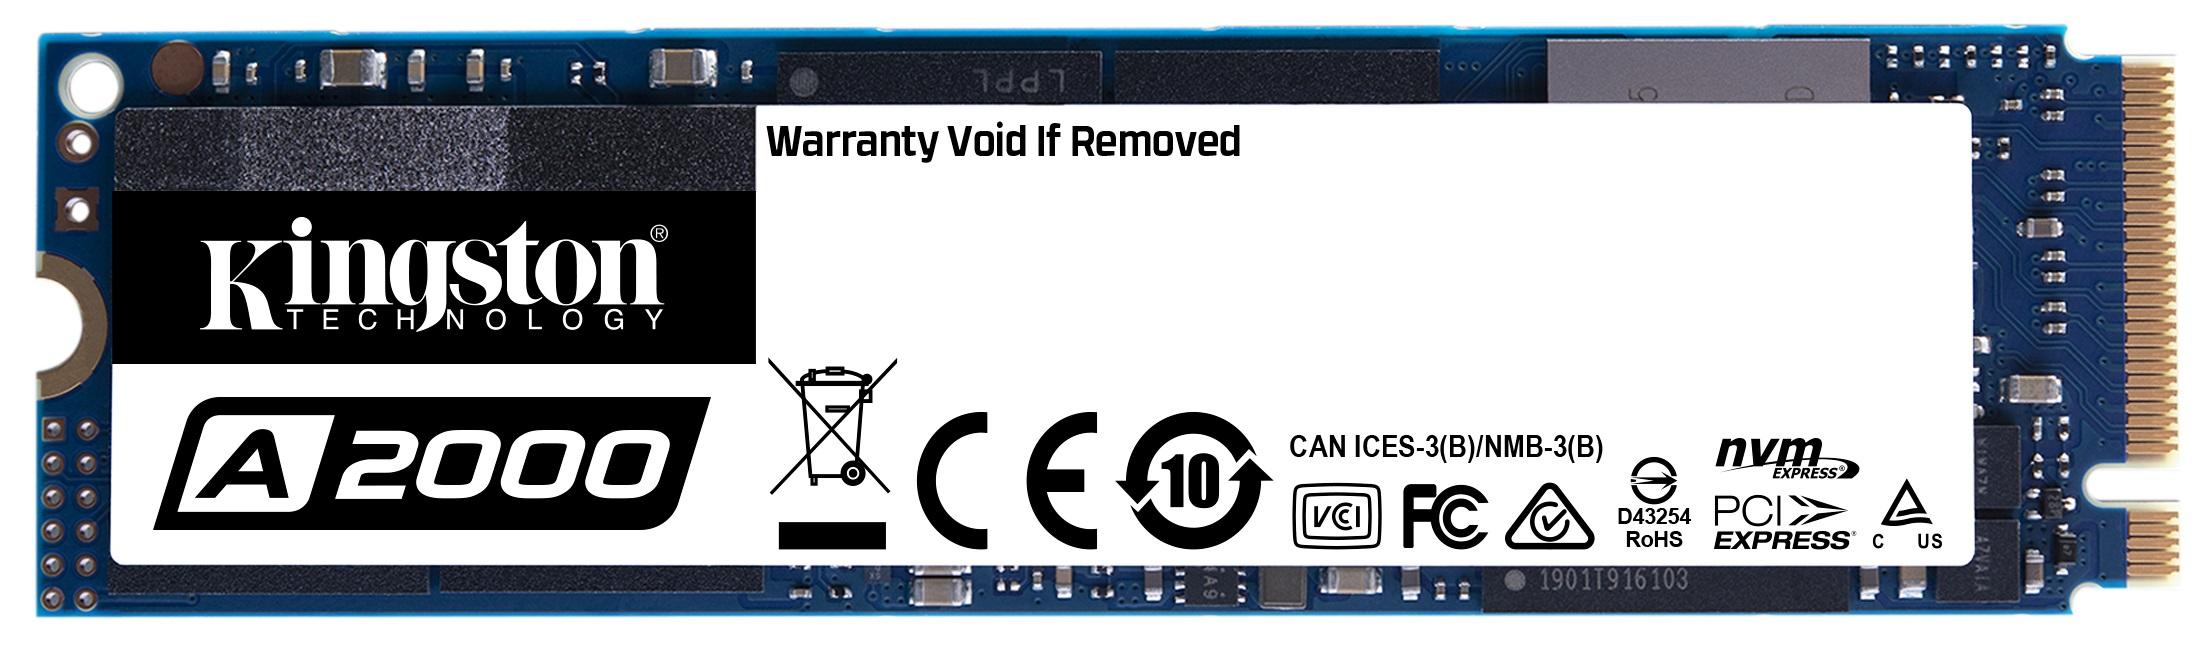 Kingston เปิดตัว SSD รุ่นใหม่ A2000 ในแบบ PCIe NVMe